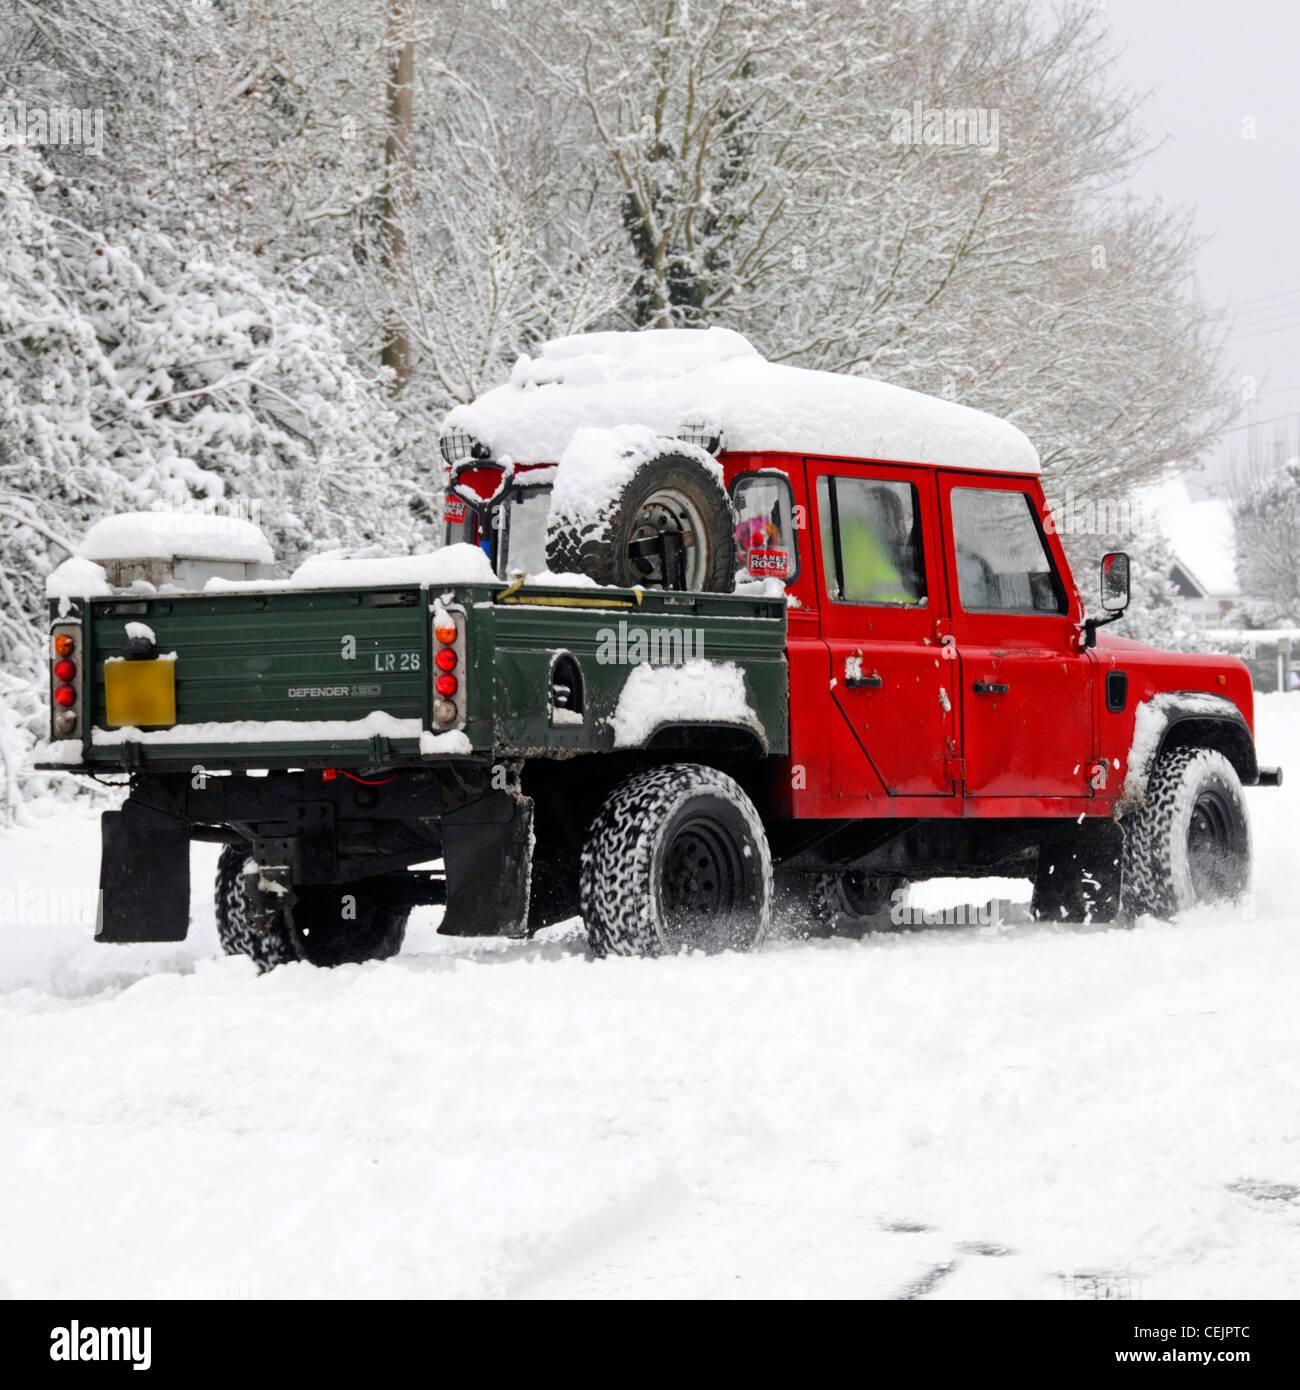 Schnee Szene Land Rover Defender 130 4x4 Fahren auf schmalen Feldweg Straße im Winter Schneefall Kälte Stockbild